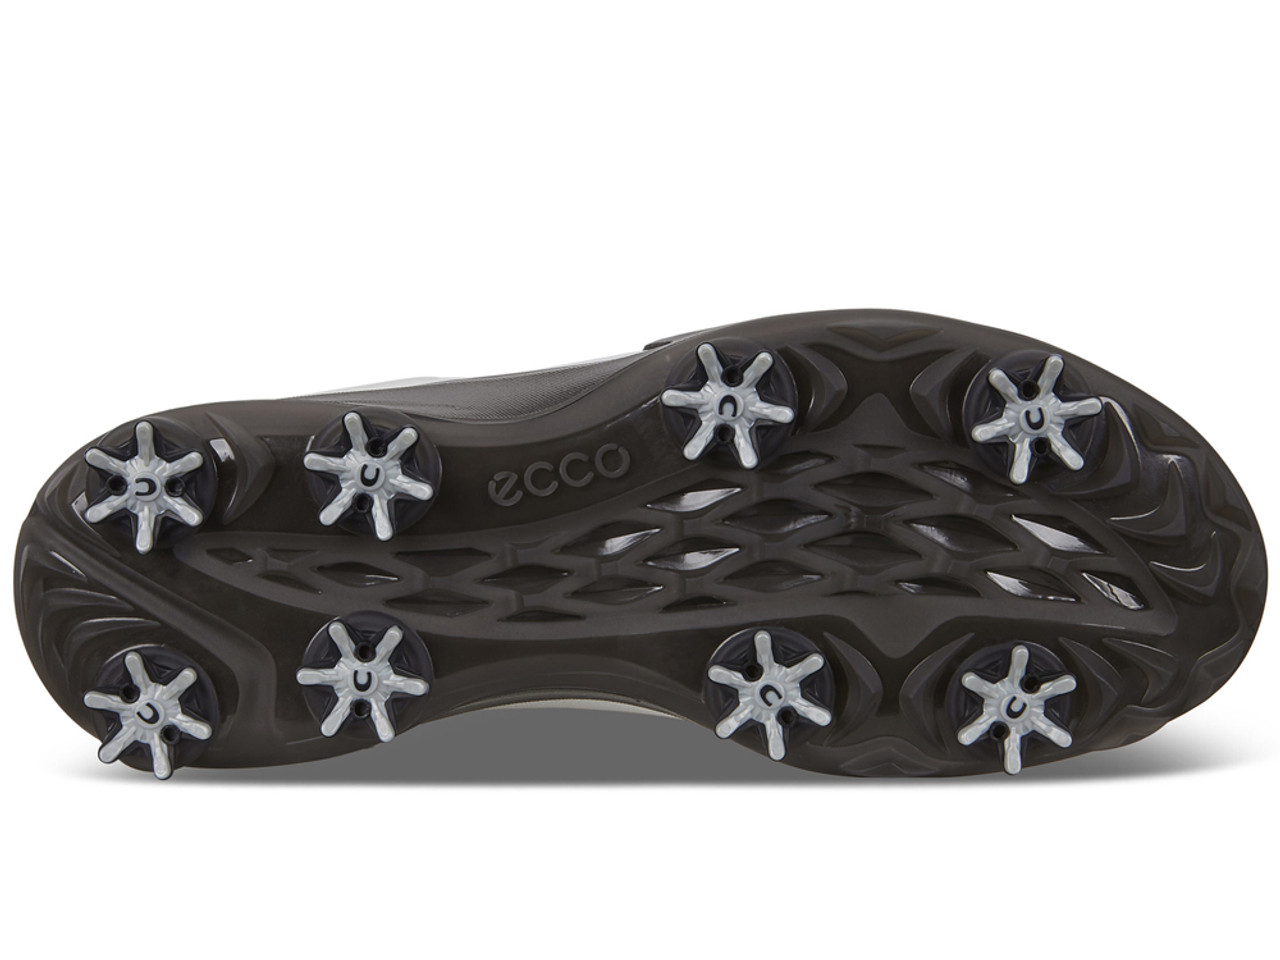 0807189d87e Ecco Biom G3 BOA Golf Shoes - Shadow/White - Mens For Sale | GolfBox